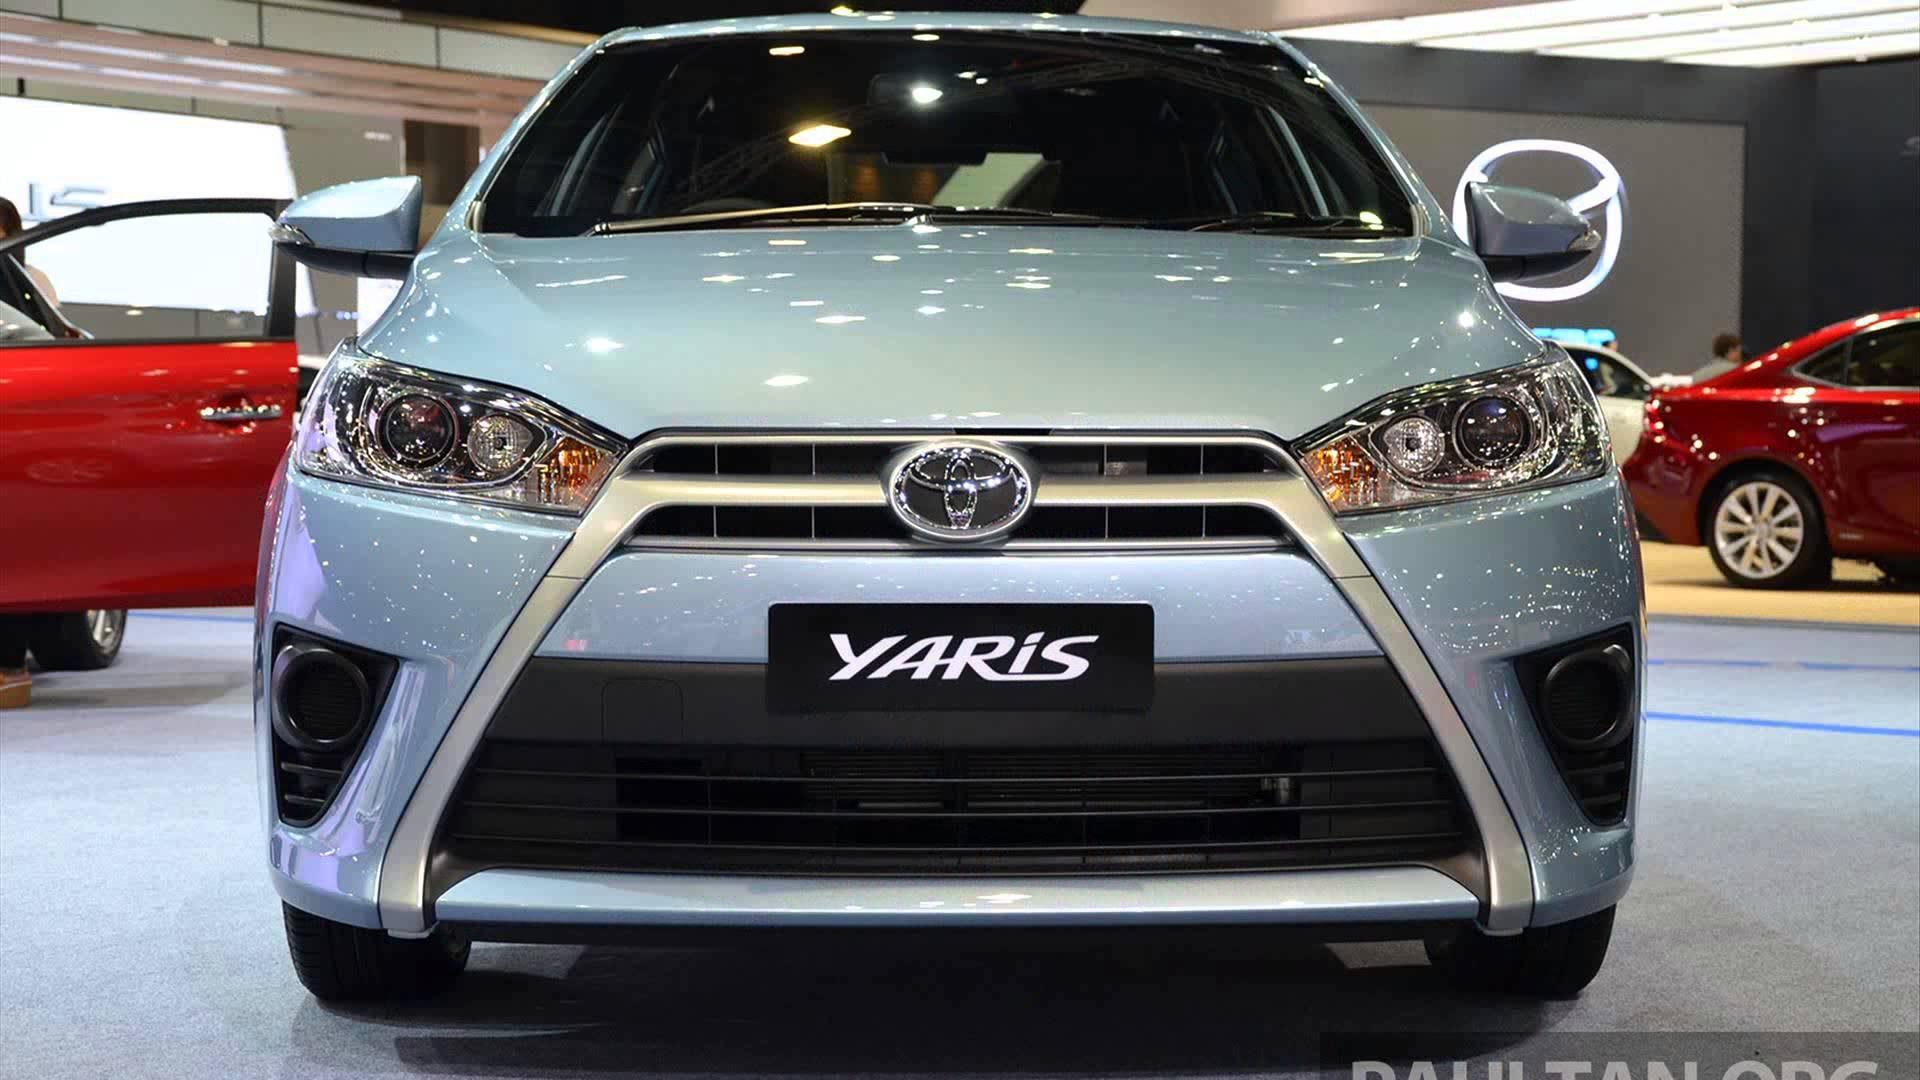 2015 Toyota Yaris Desktop Background Wallpapers 1920x1080